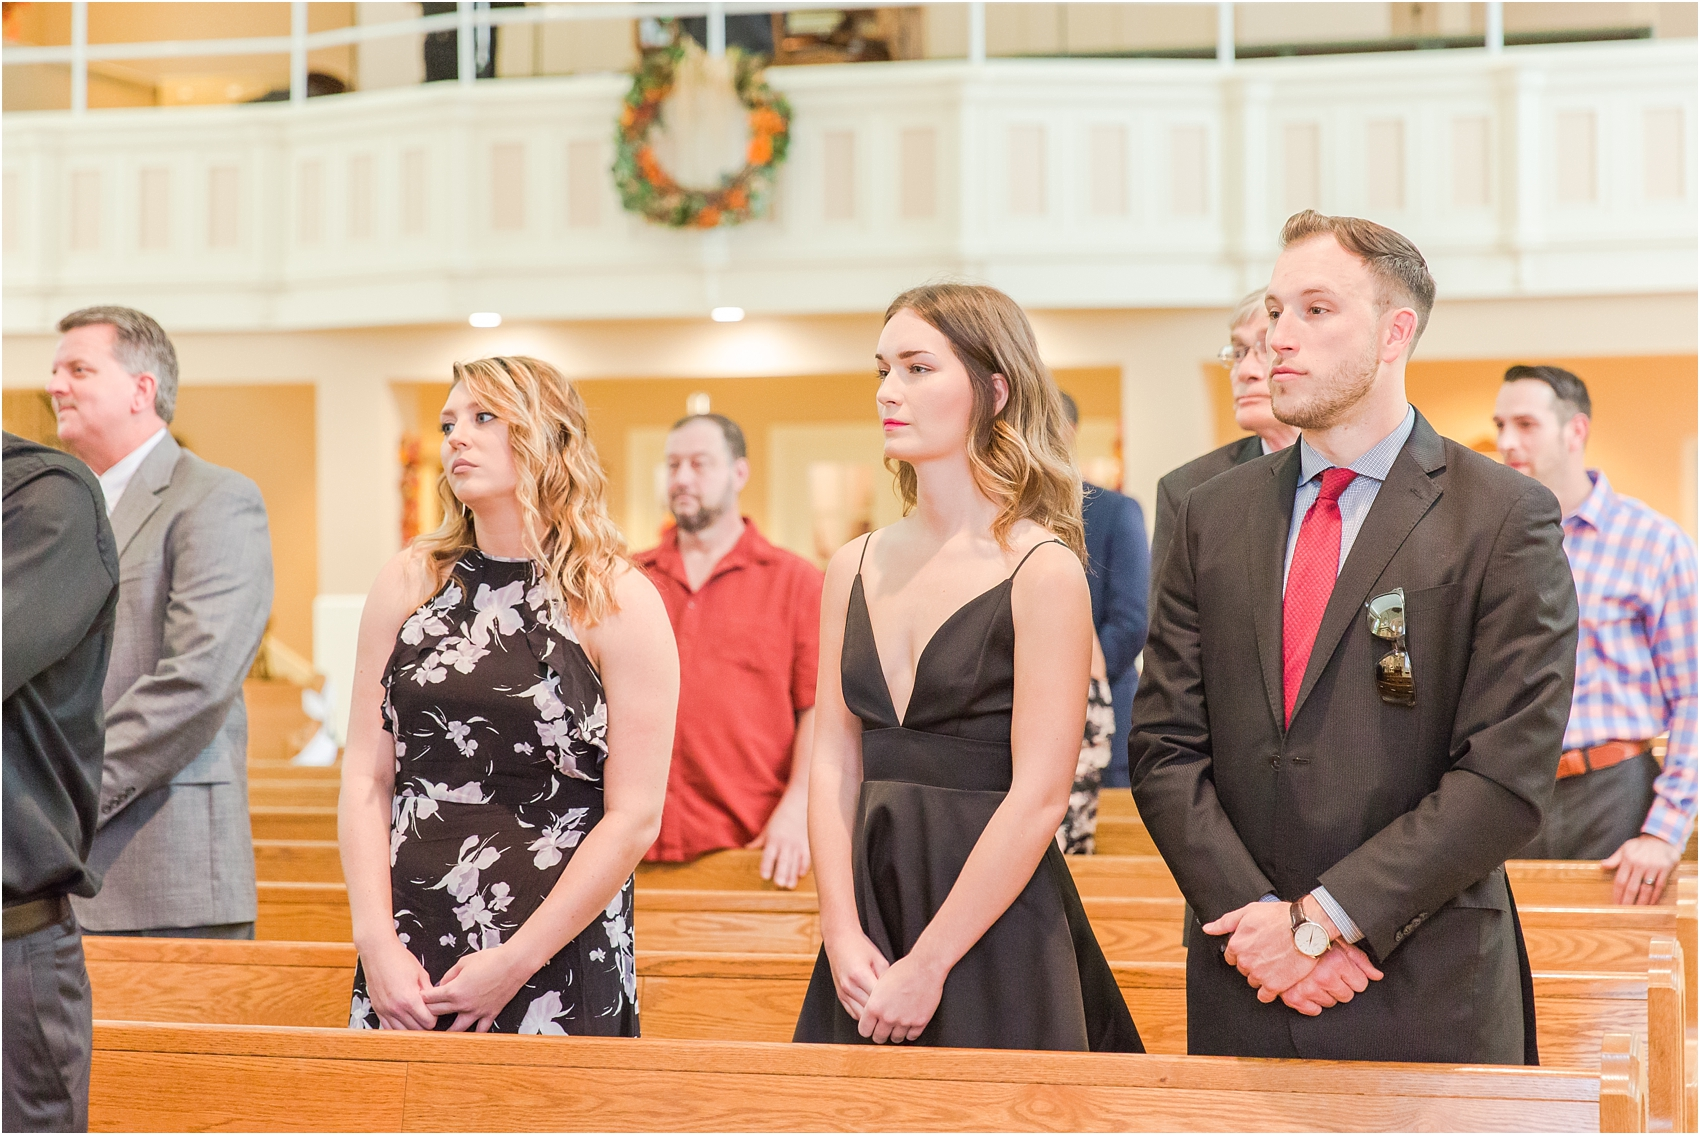 elegant-and-romantic-fall-wedding-photos-at-st-marys-catholic-church-in-monroe-michigan-by-courtney-carolyn-photography_0017.jpg